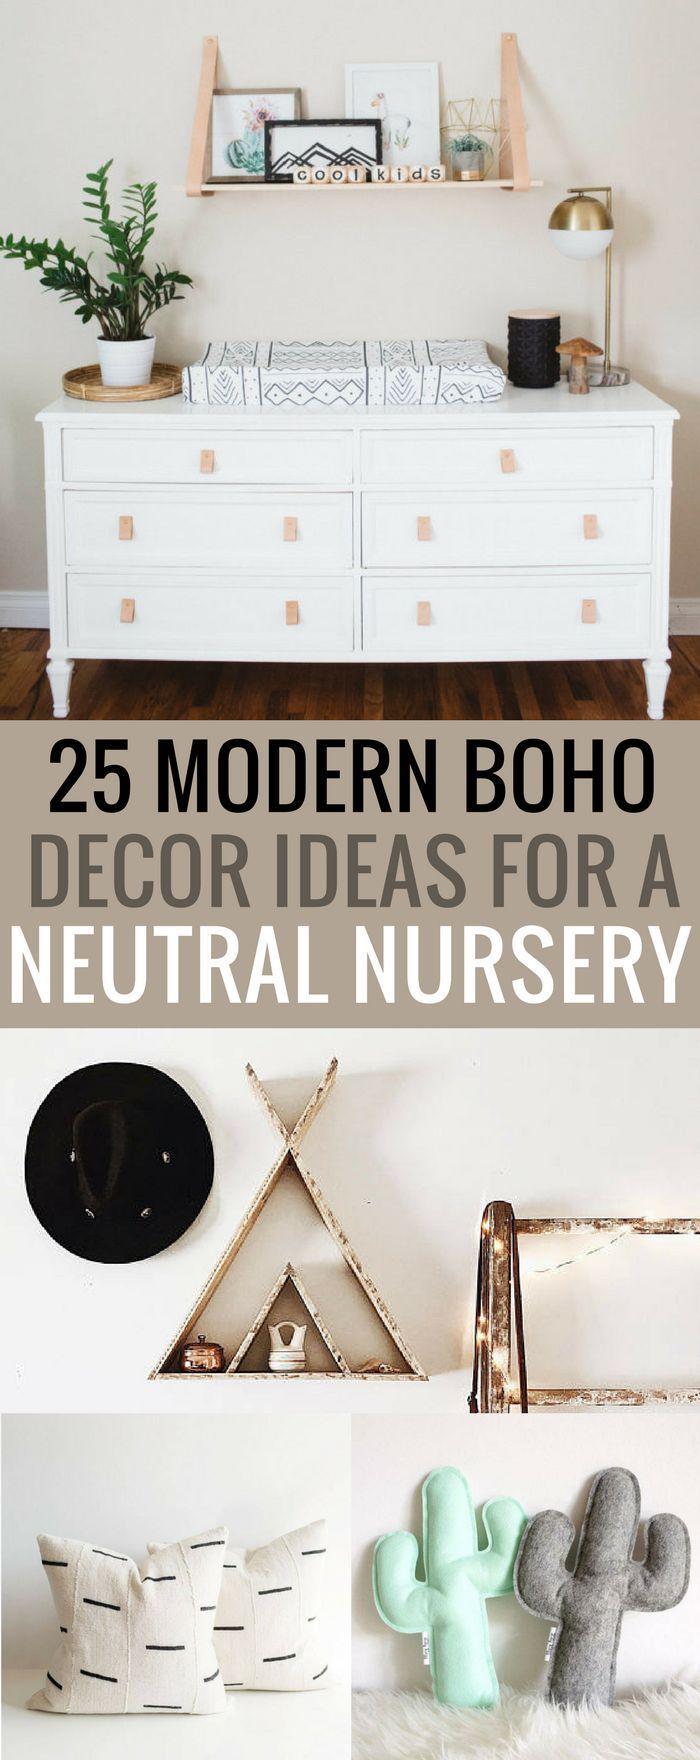 25 modern boho decoration ideas for your baby's nursery